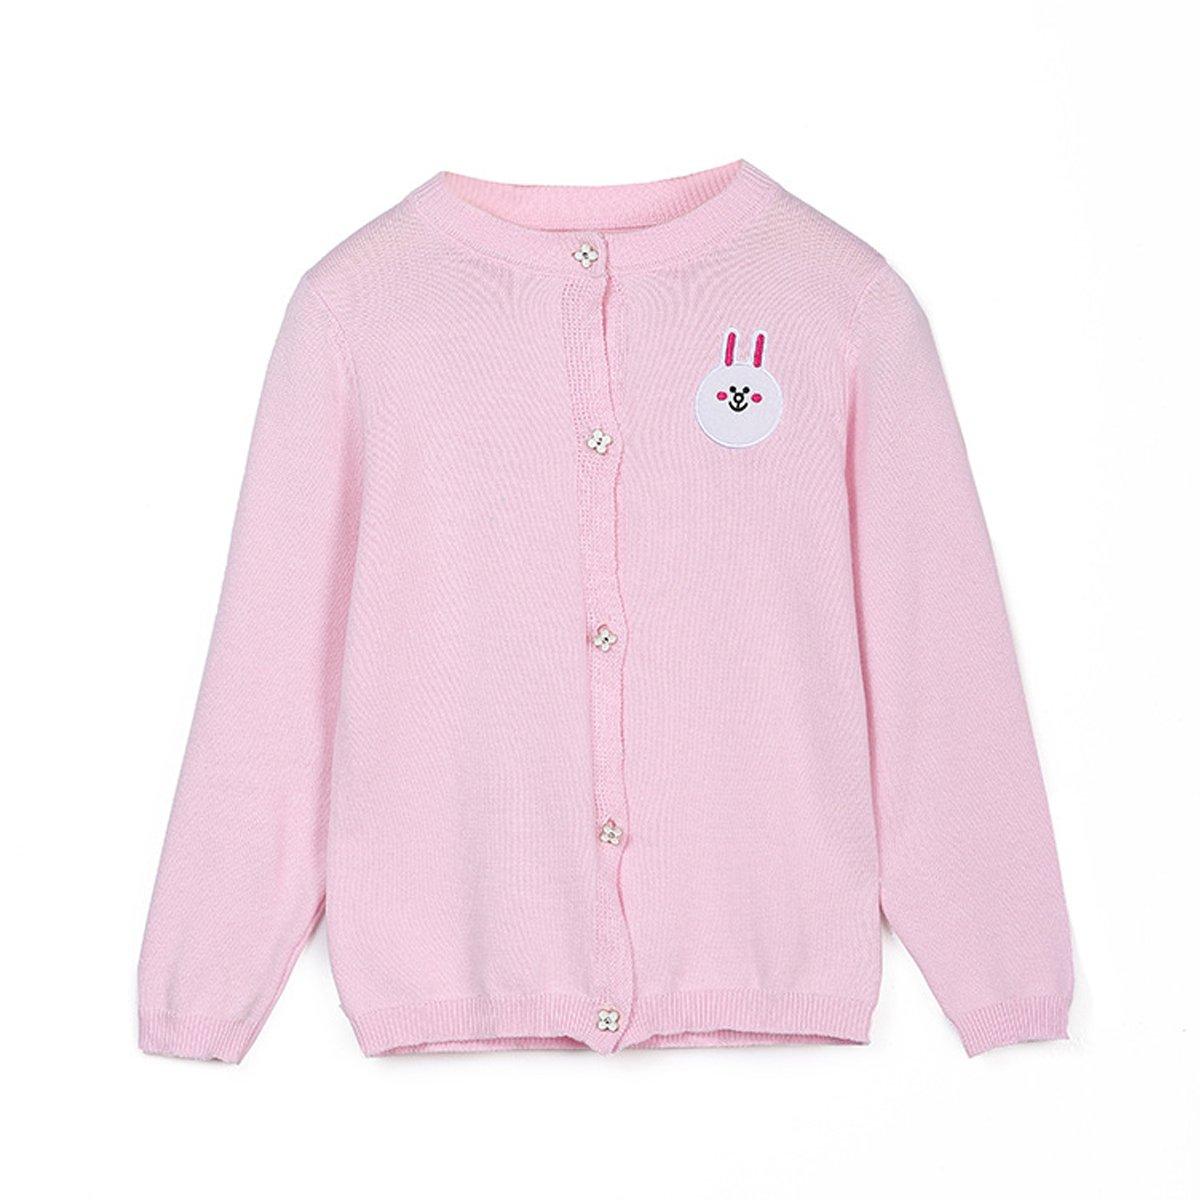 Kanodan Girls Kids Cotton Cardigan Top Rabbit Embroidery Pattern Sweater Coat